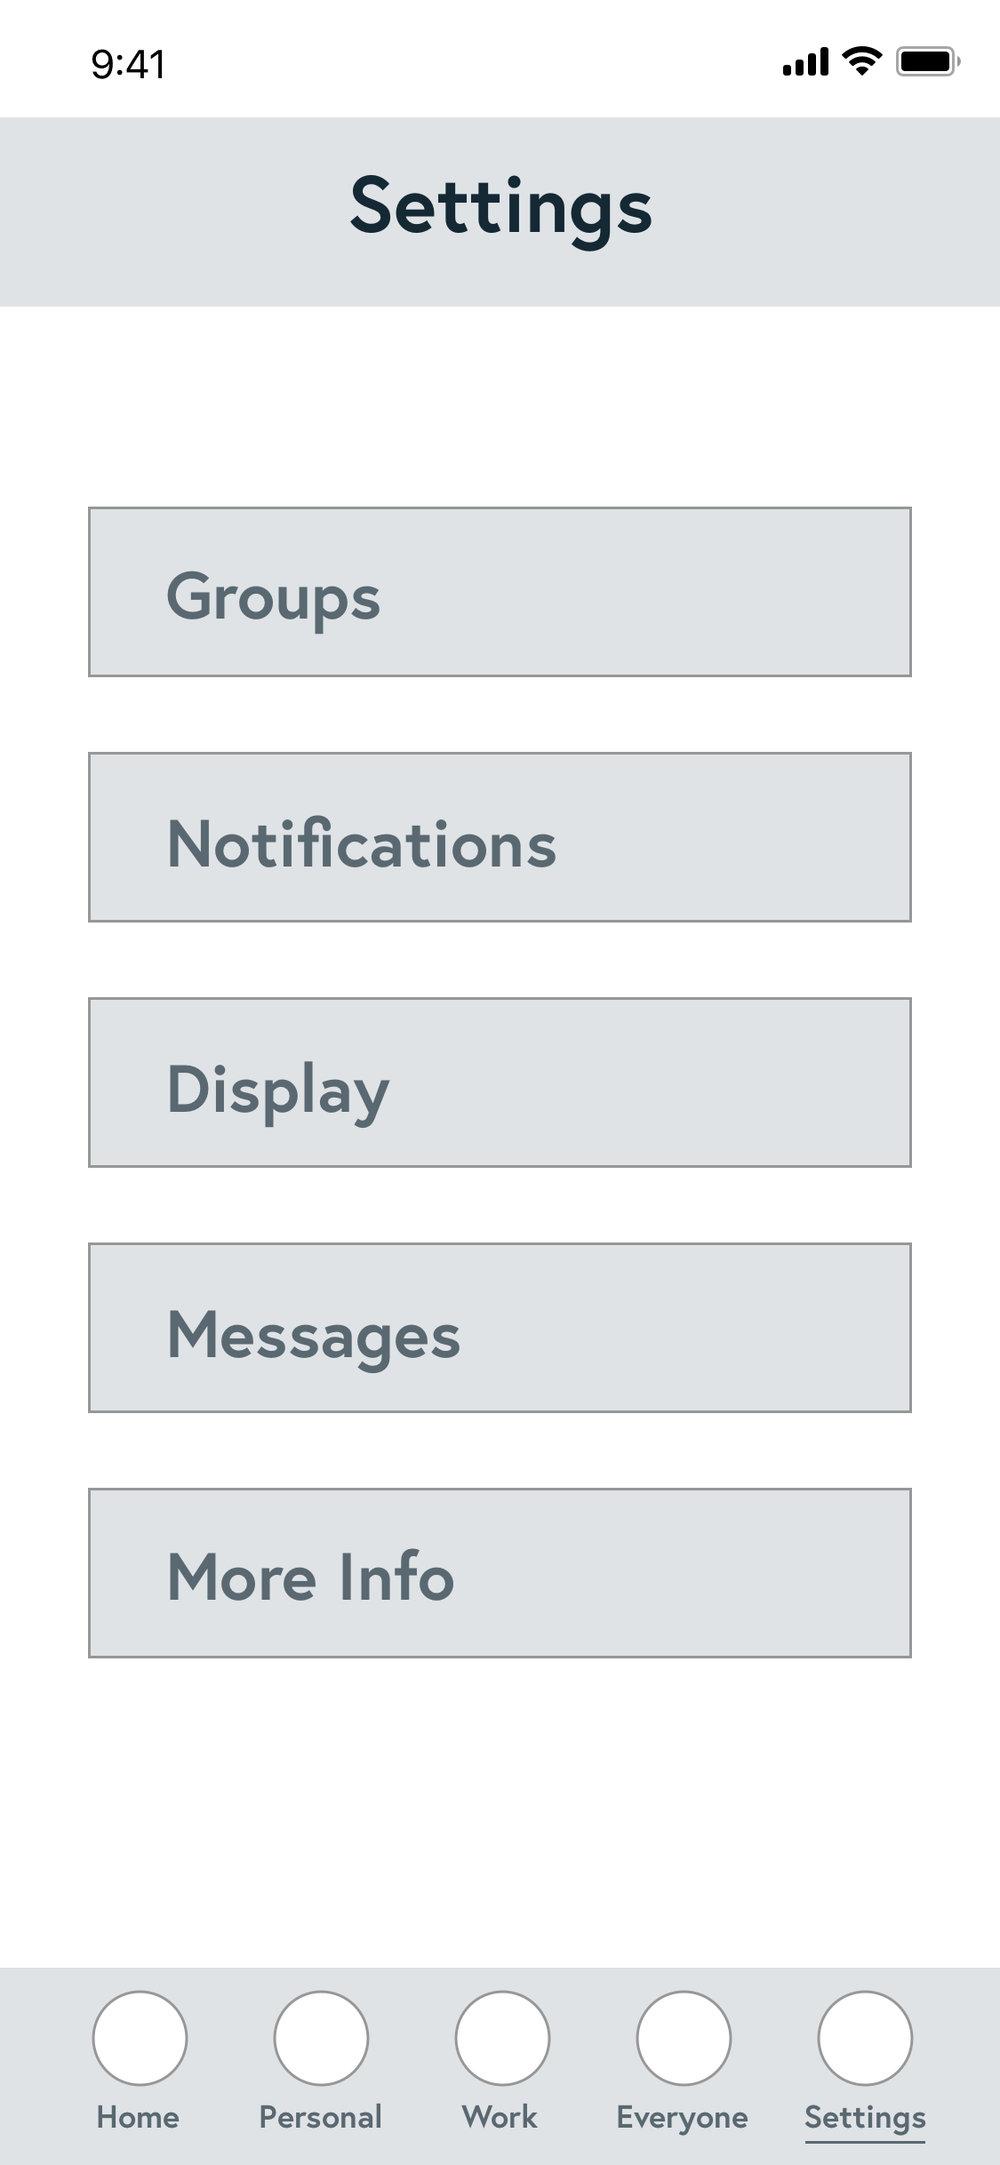 Main settings page